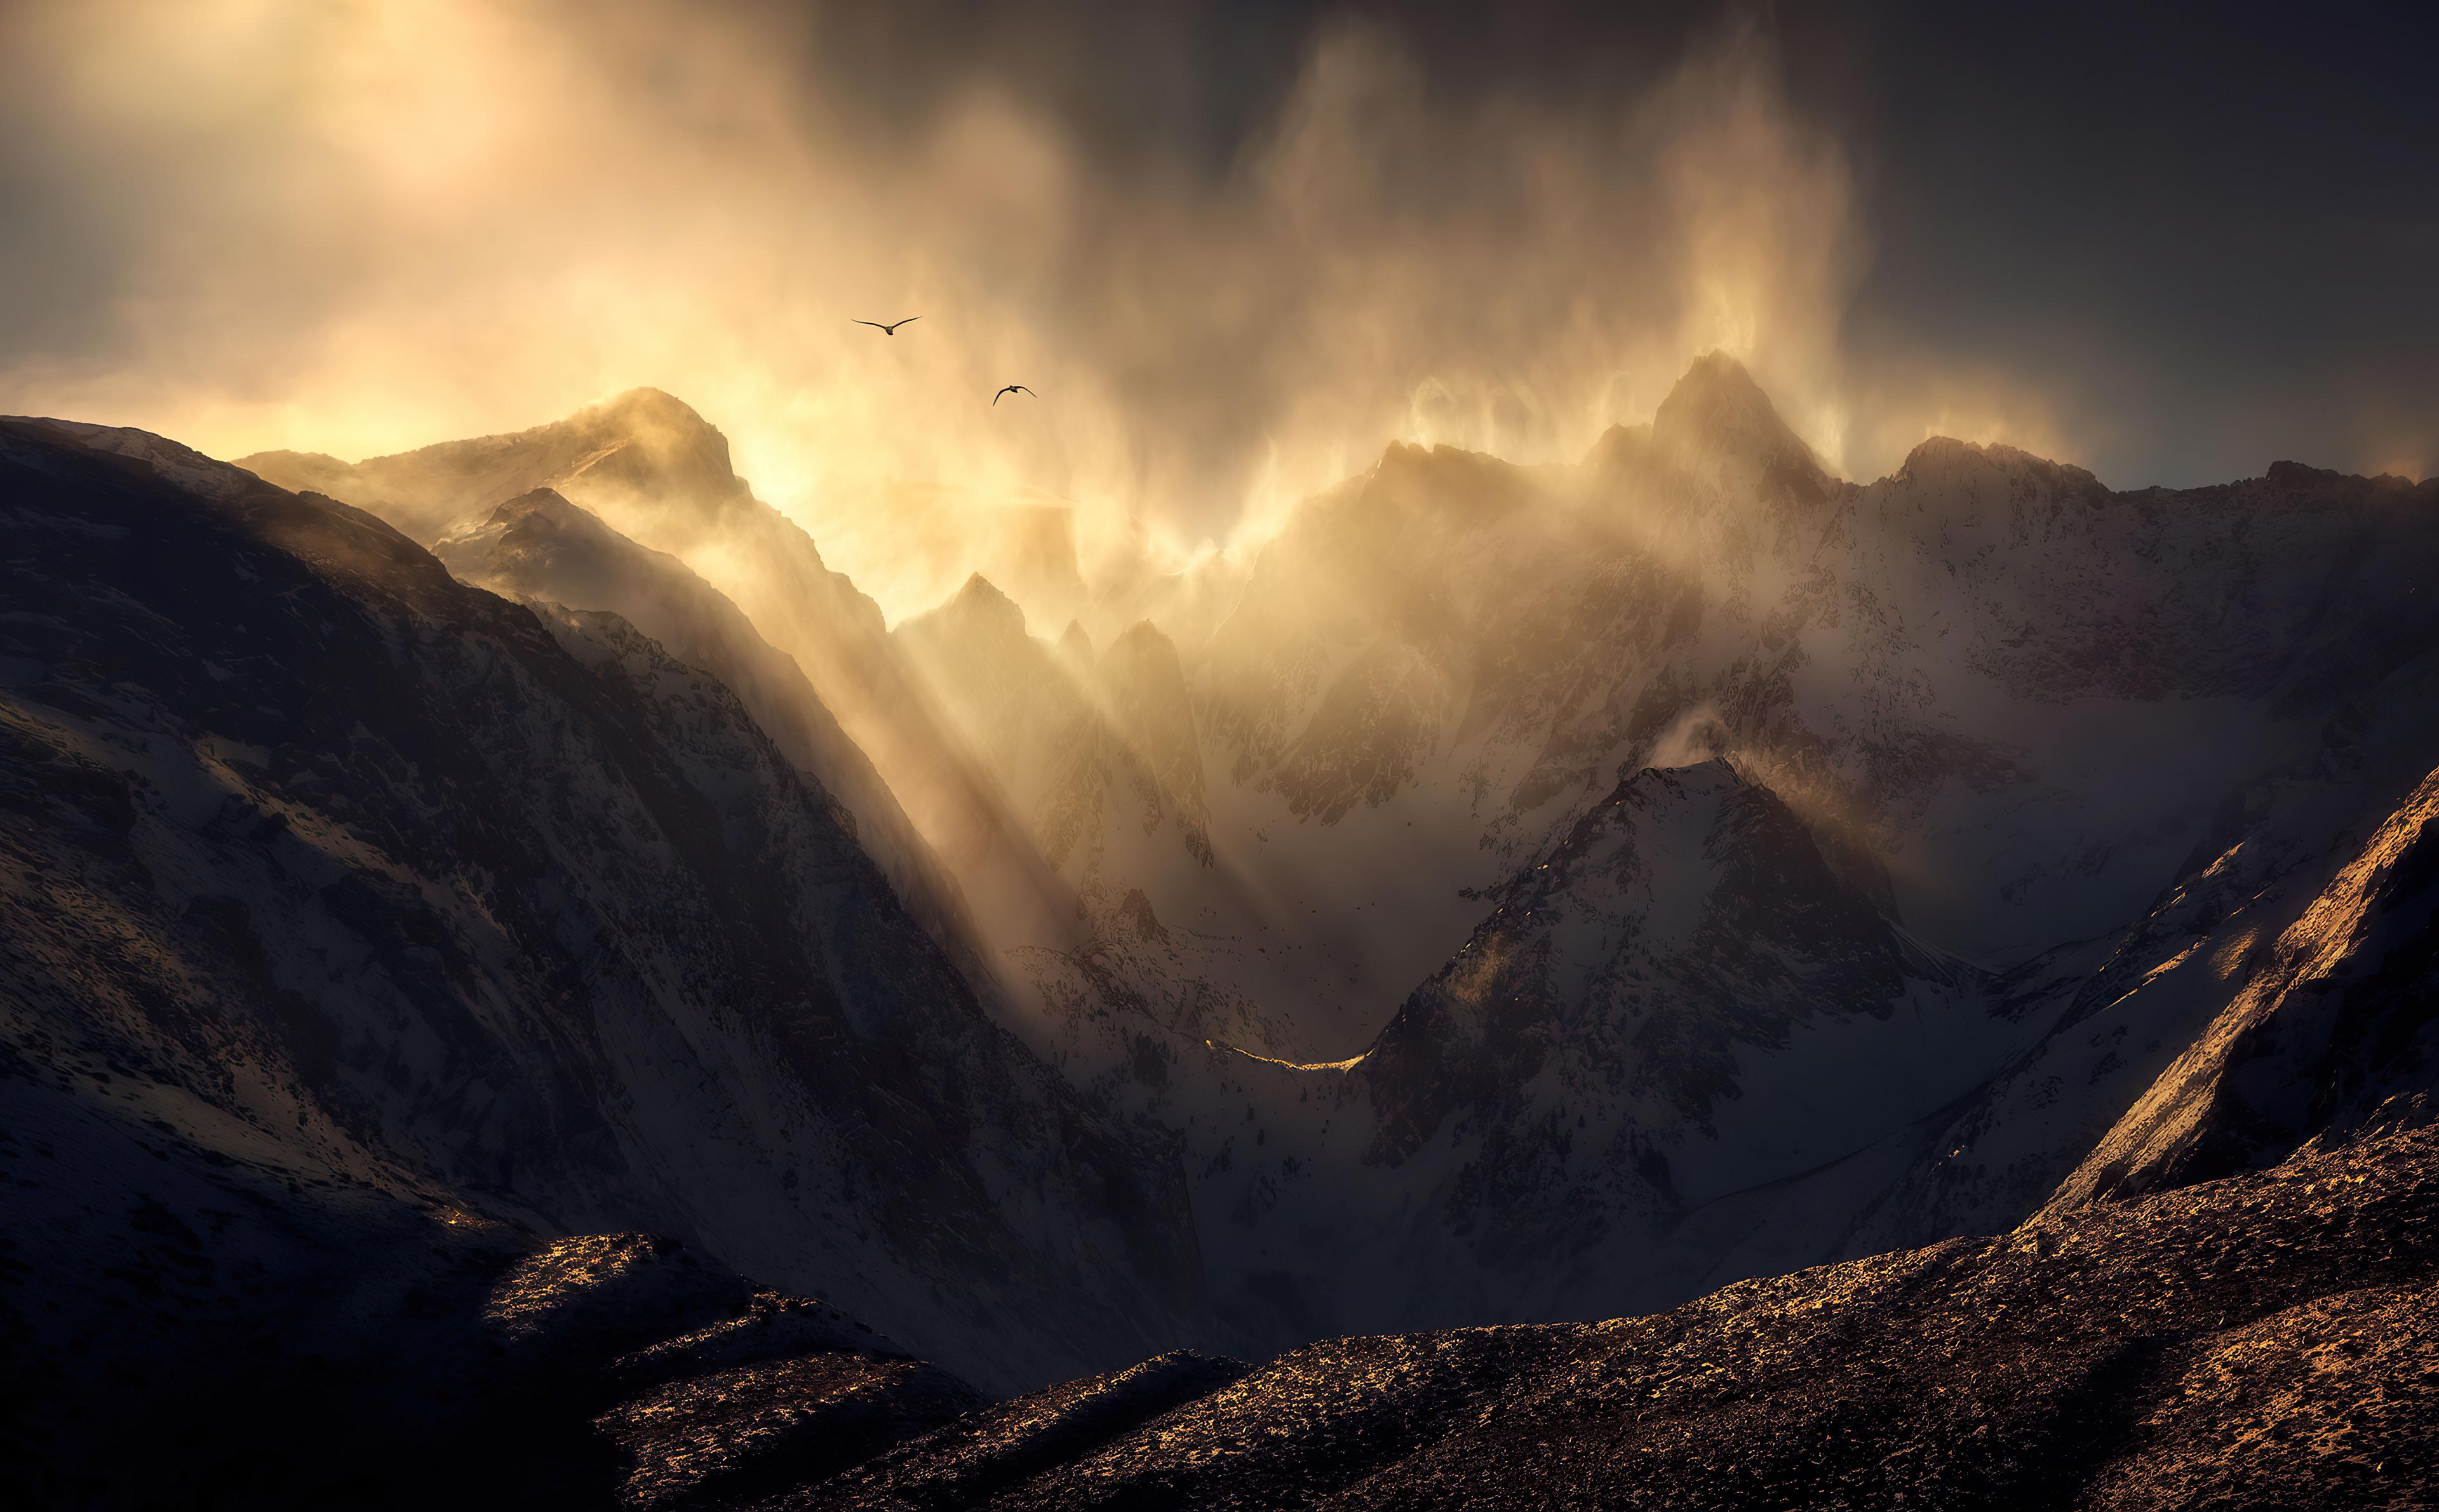 sierra nevada mount range sun rays 4k 1602606154 - Sierra Nevada Mount Range Sun Rays 4k - Sierra Nevada Mount Range Sun Rays 4k wallpapers